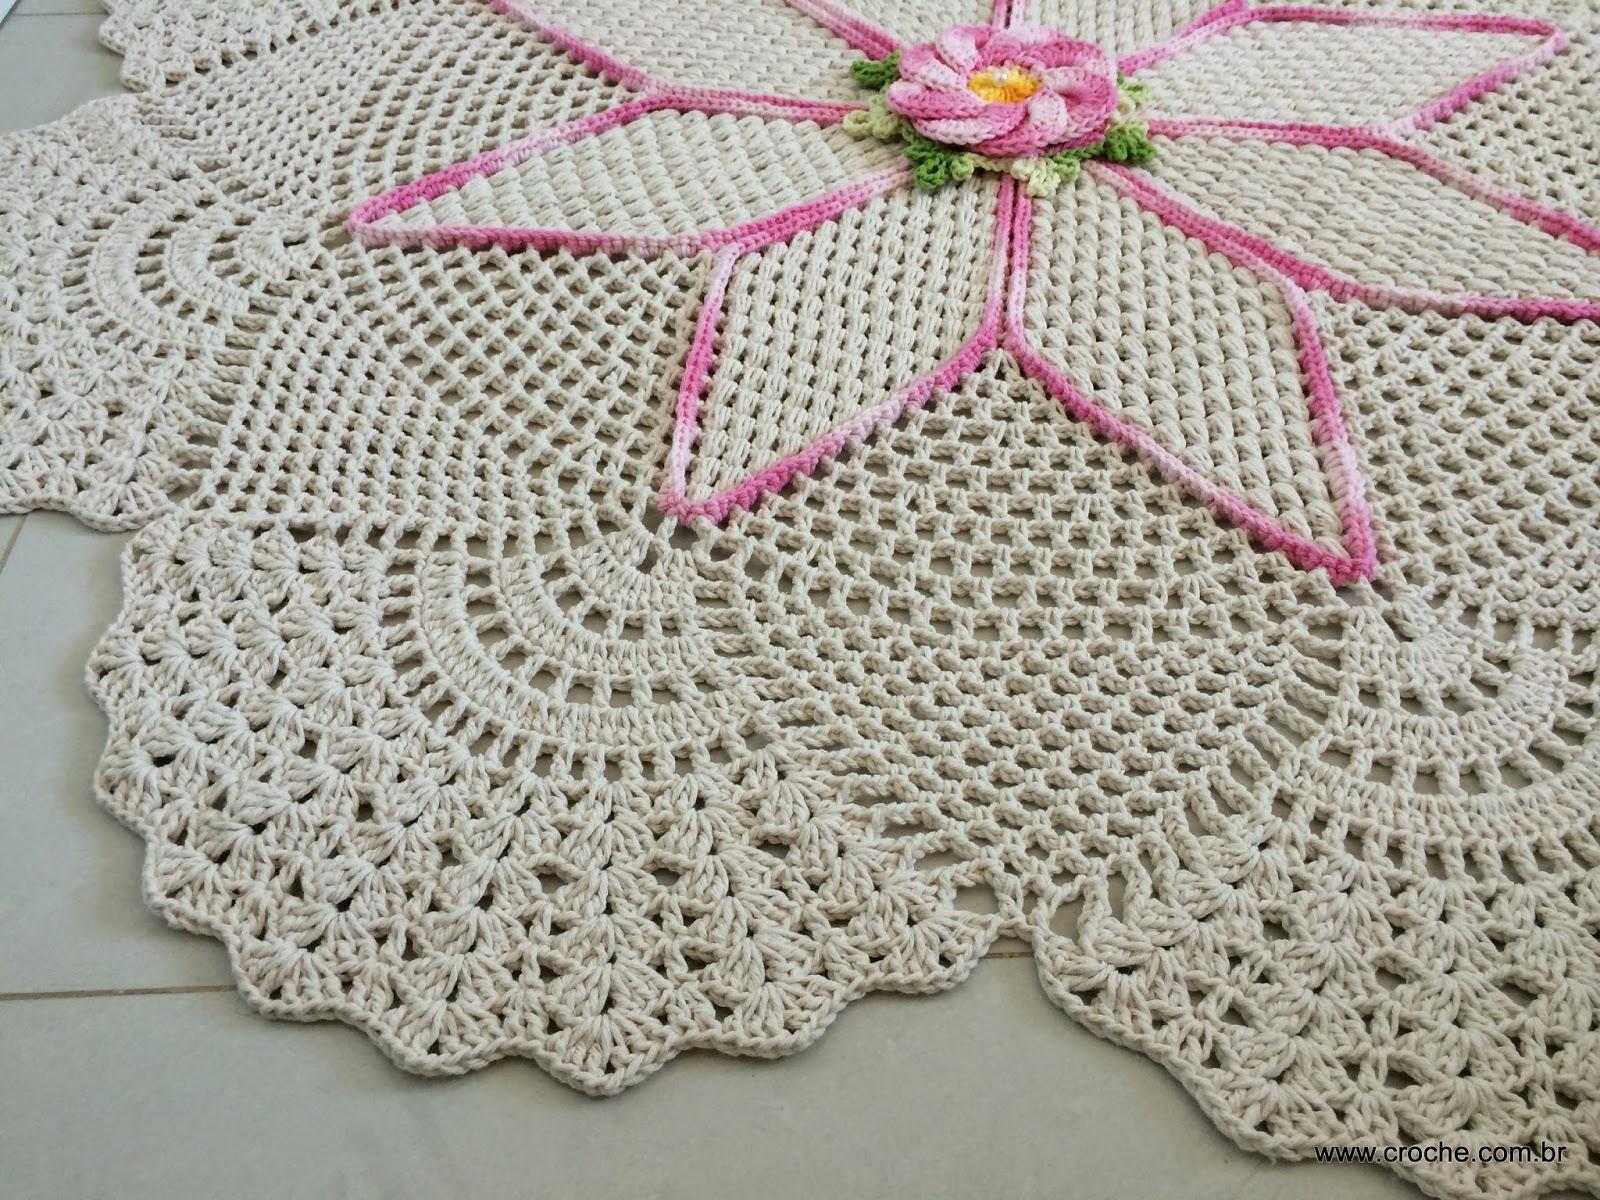 Tapete Redondo Flor Bergamota Croche Com Br -> Tapete Para Sala De Barbante Redondo